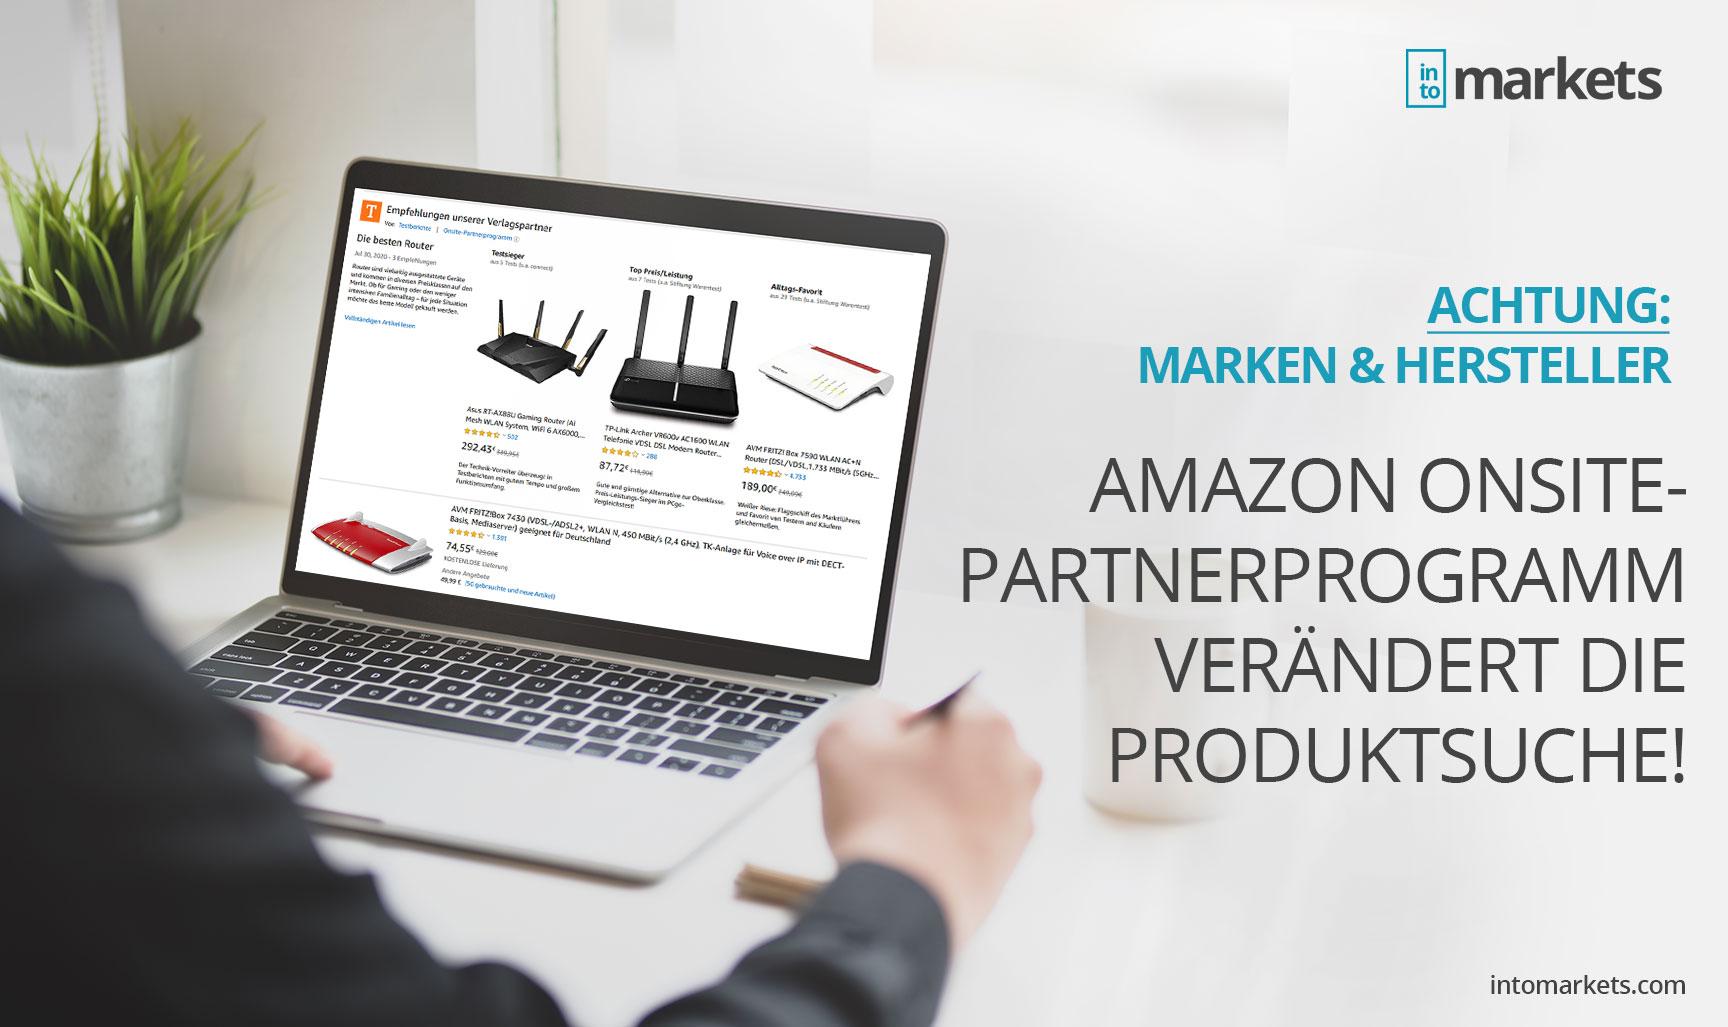 amazon-onsite-partnerprogramm-wiki-intomarkets